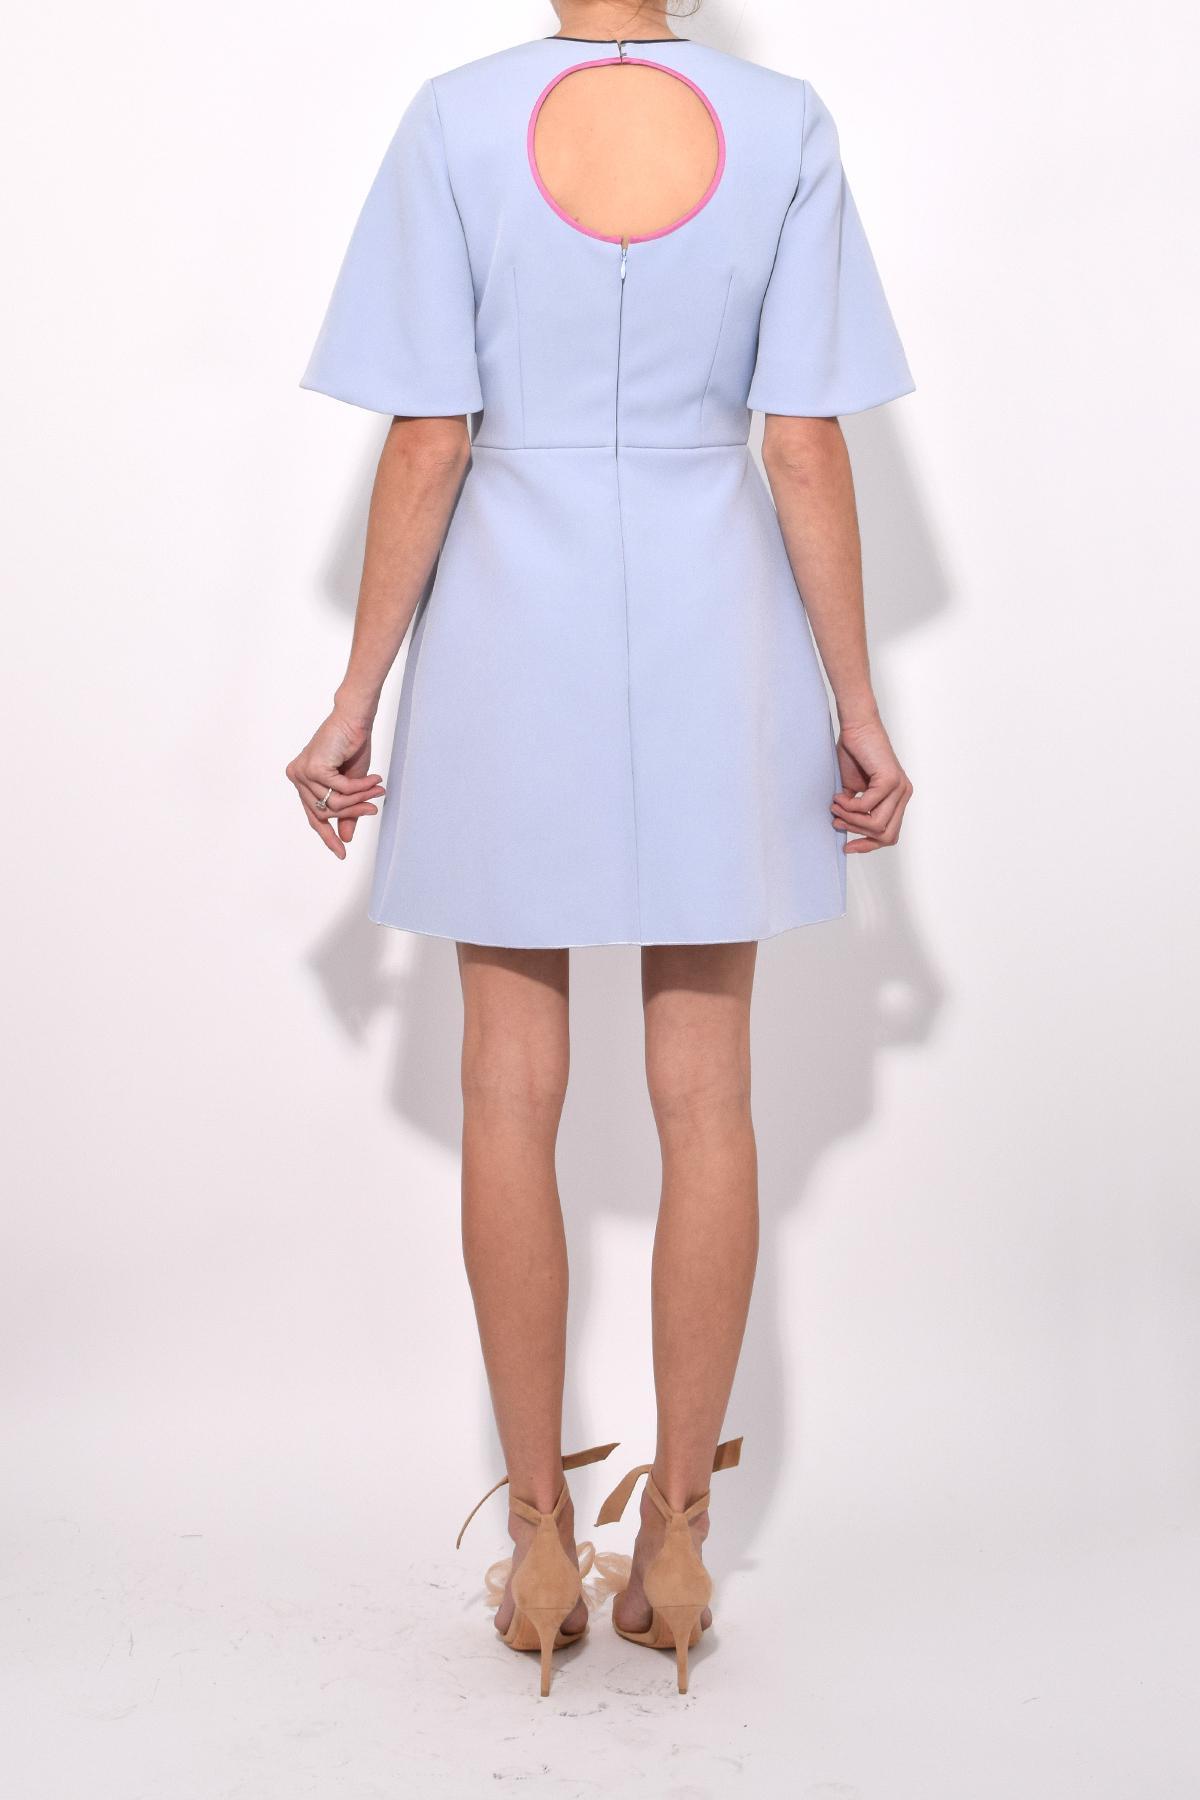 Layken dress Roksanda Ilincic 1M4gc